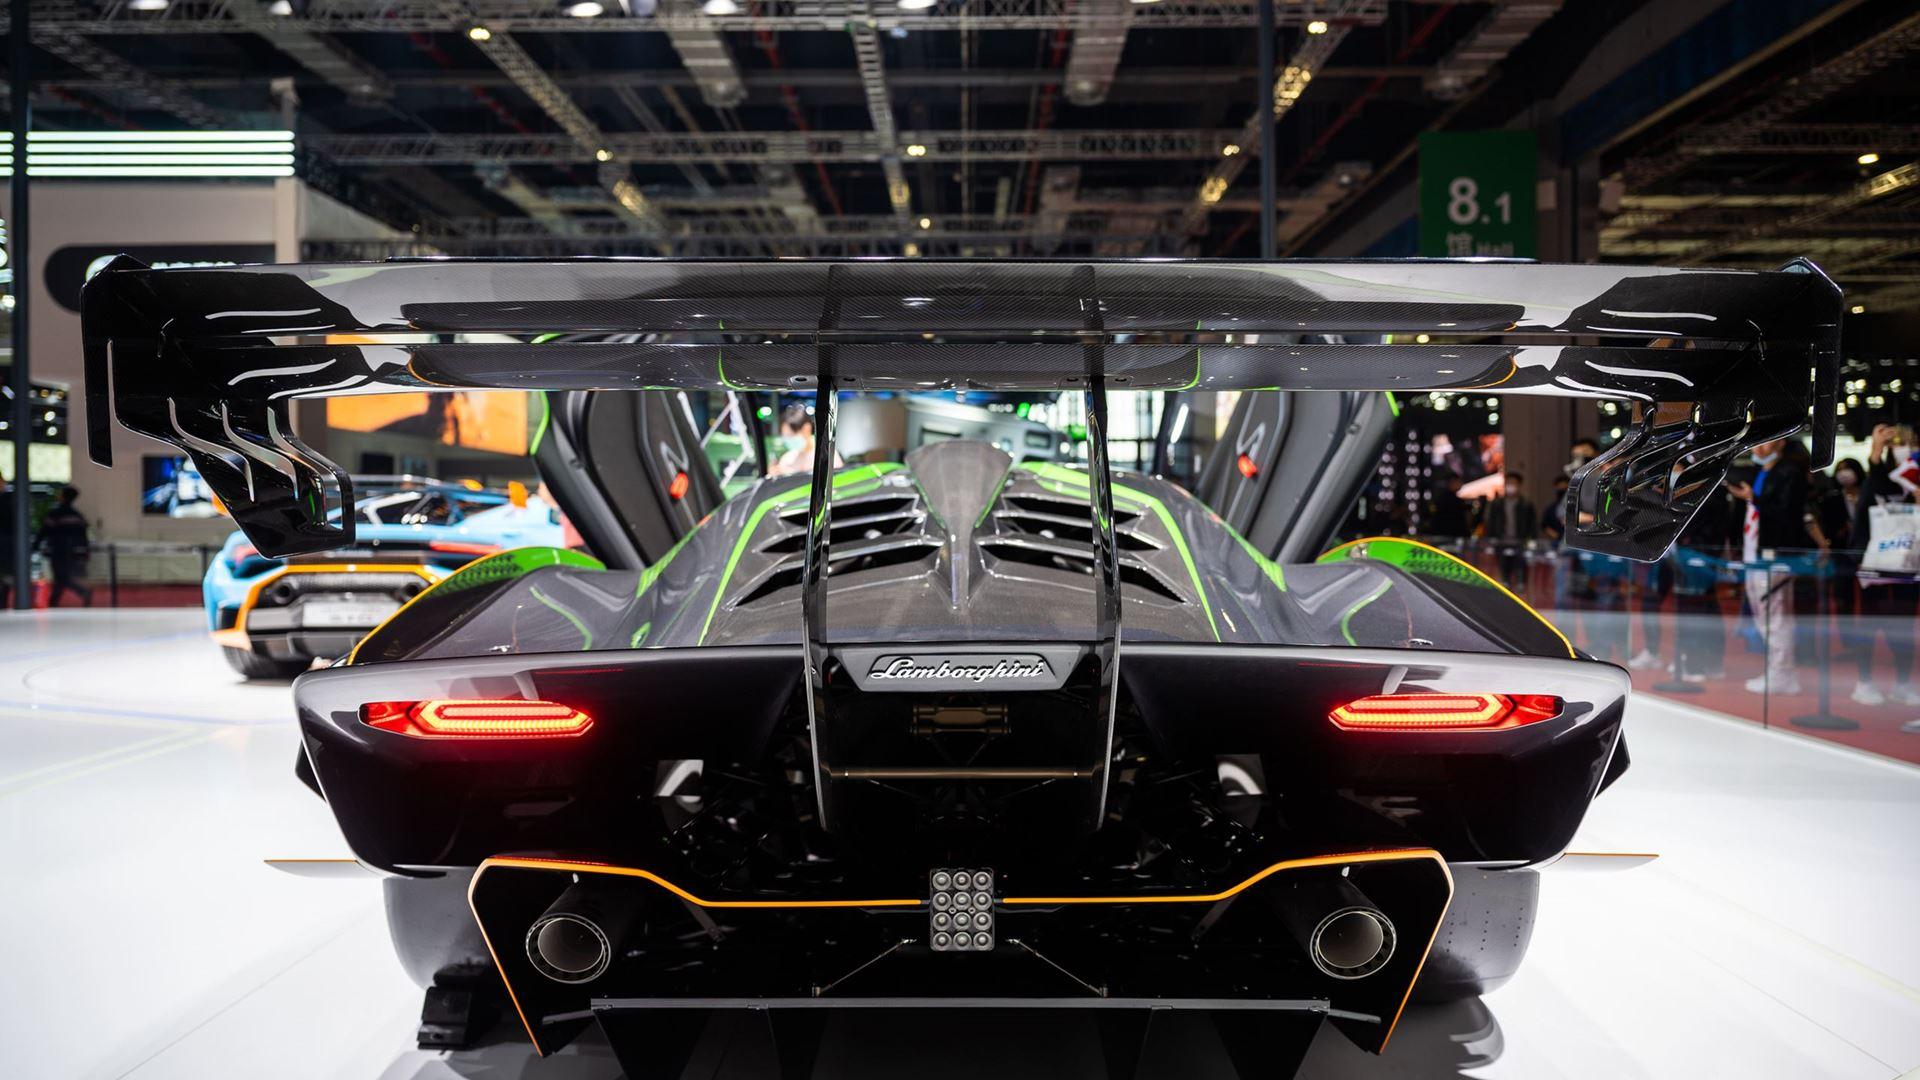 Three premieres for Automobili Lamborghini at the 2021 Shanghai Auto Show - Image 3